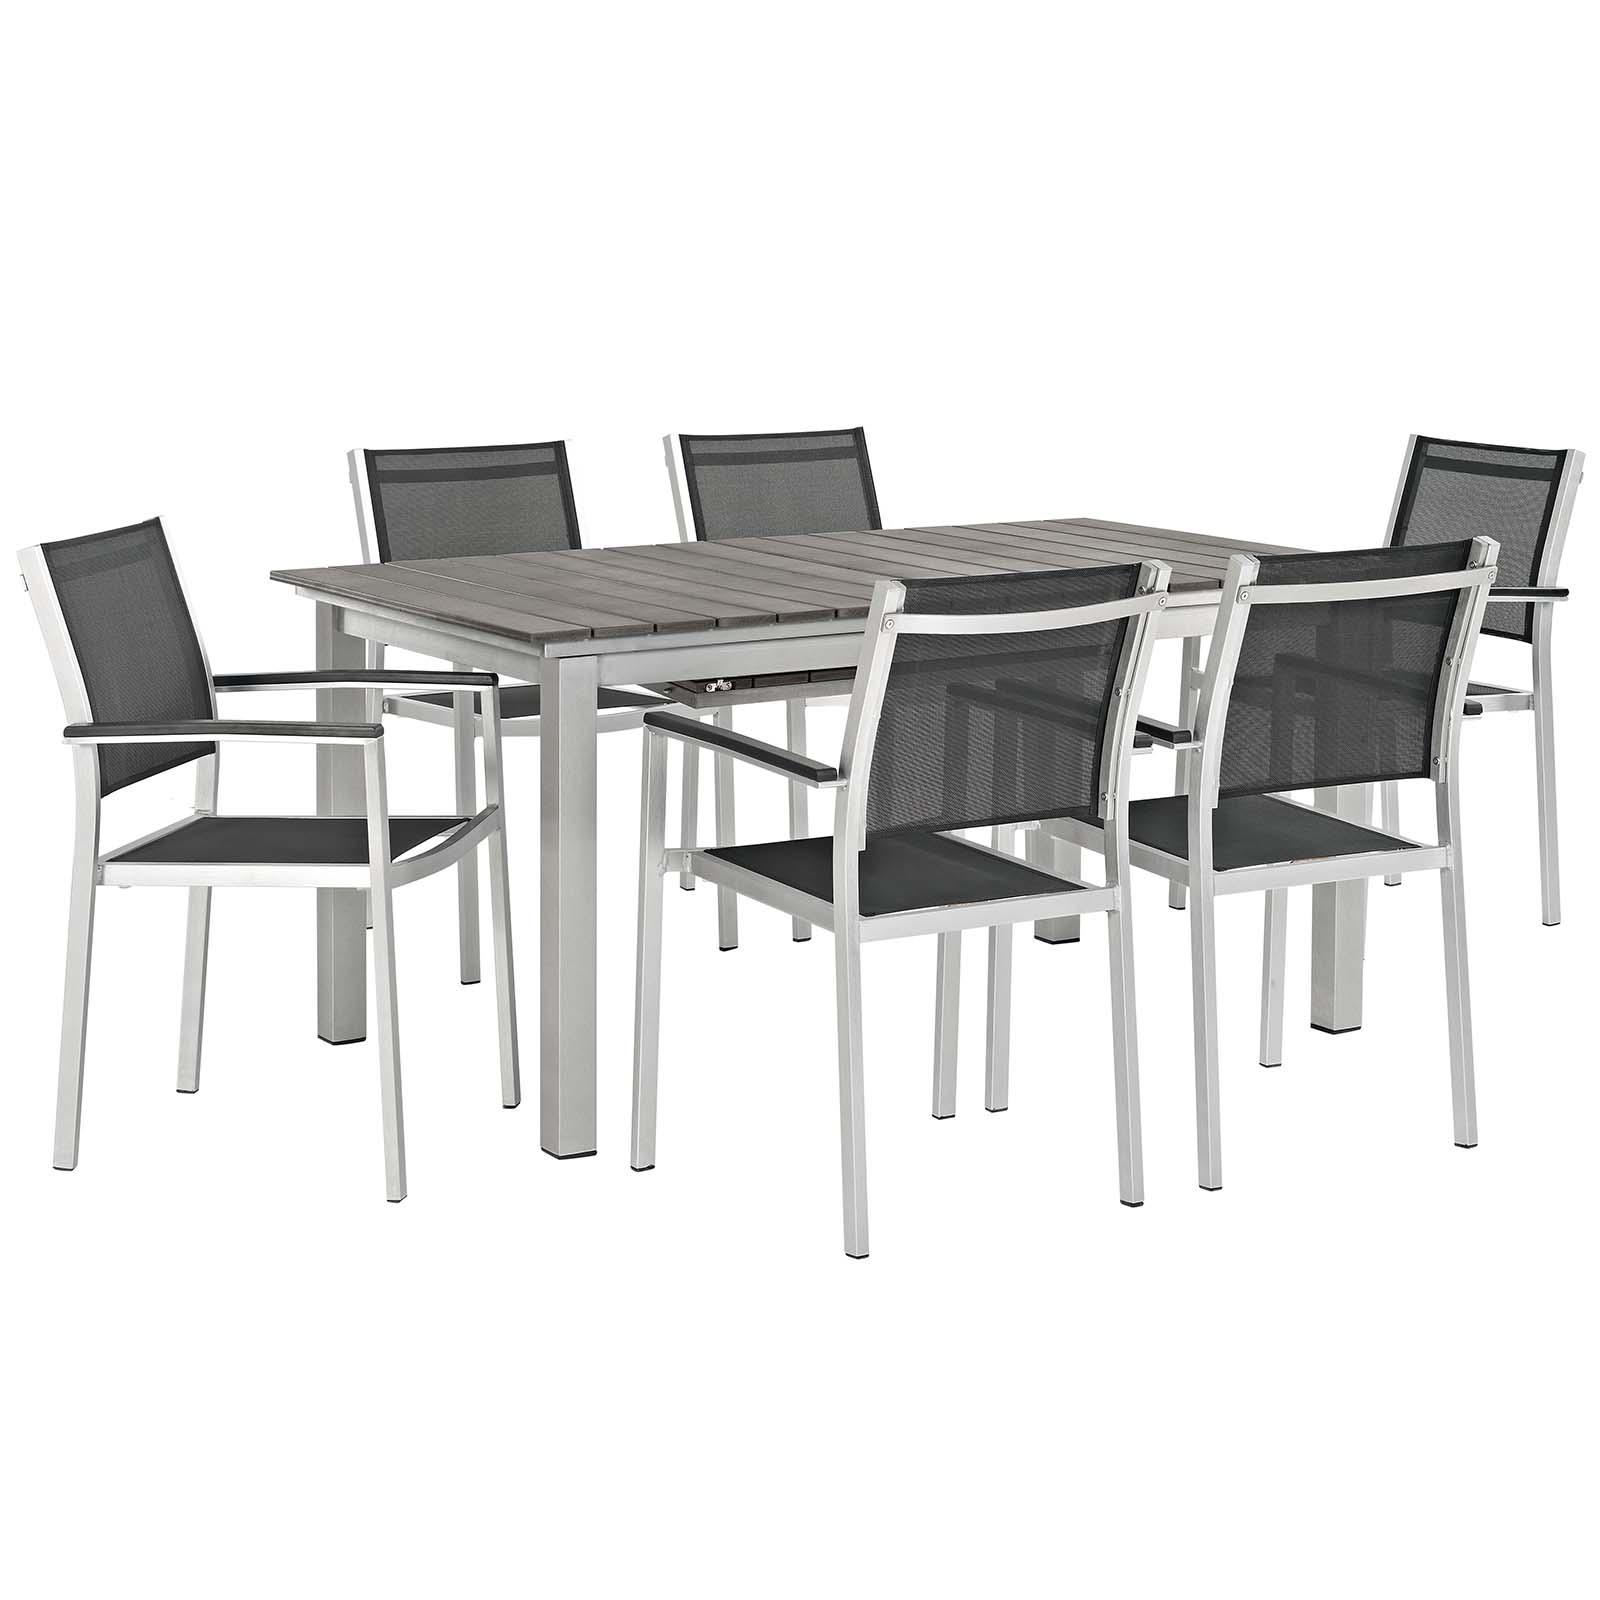 Shore 7 Piece Outdoor Patio Aluminum Outdoor Dining Set in Silver Black